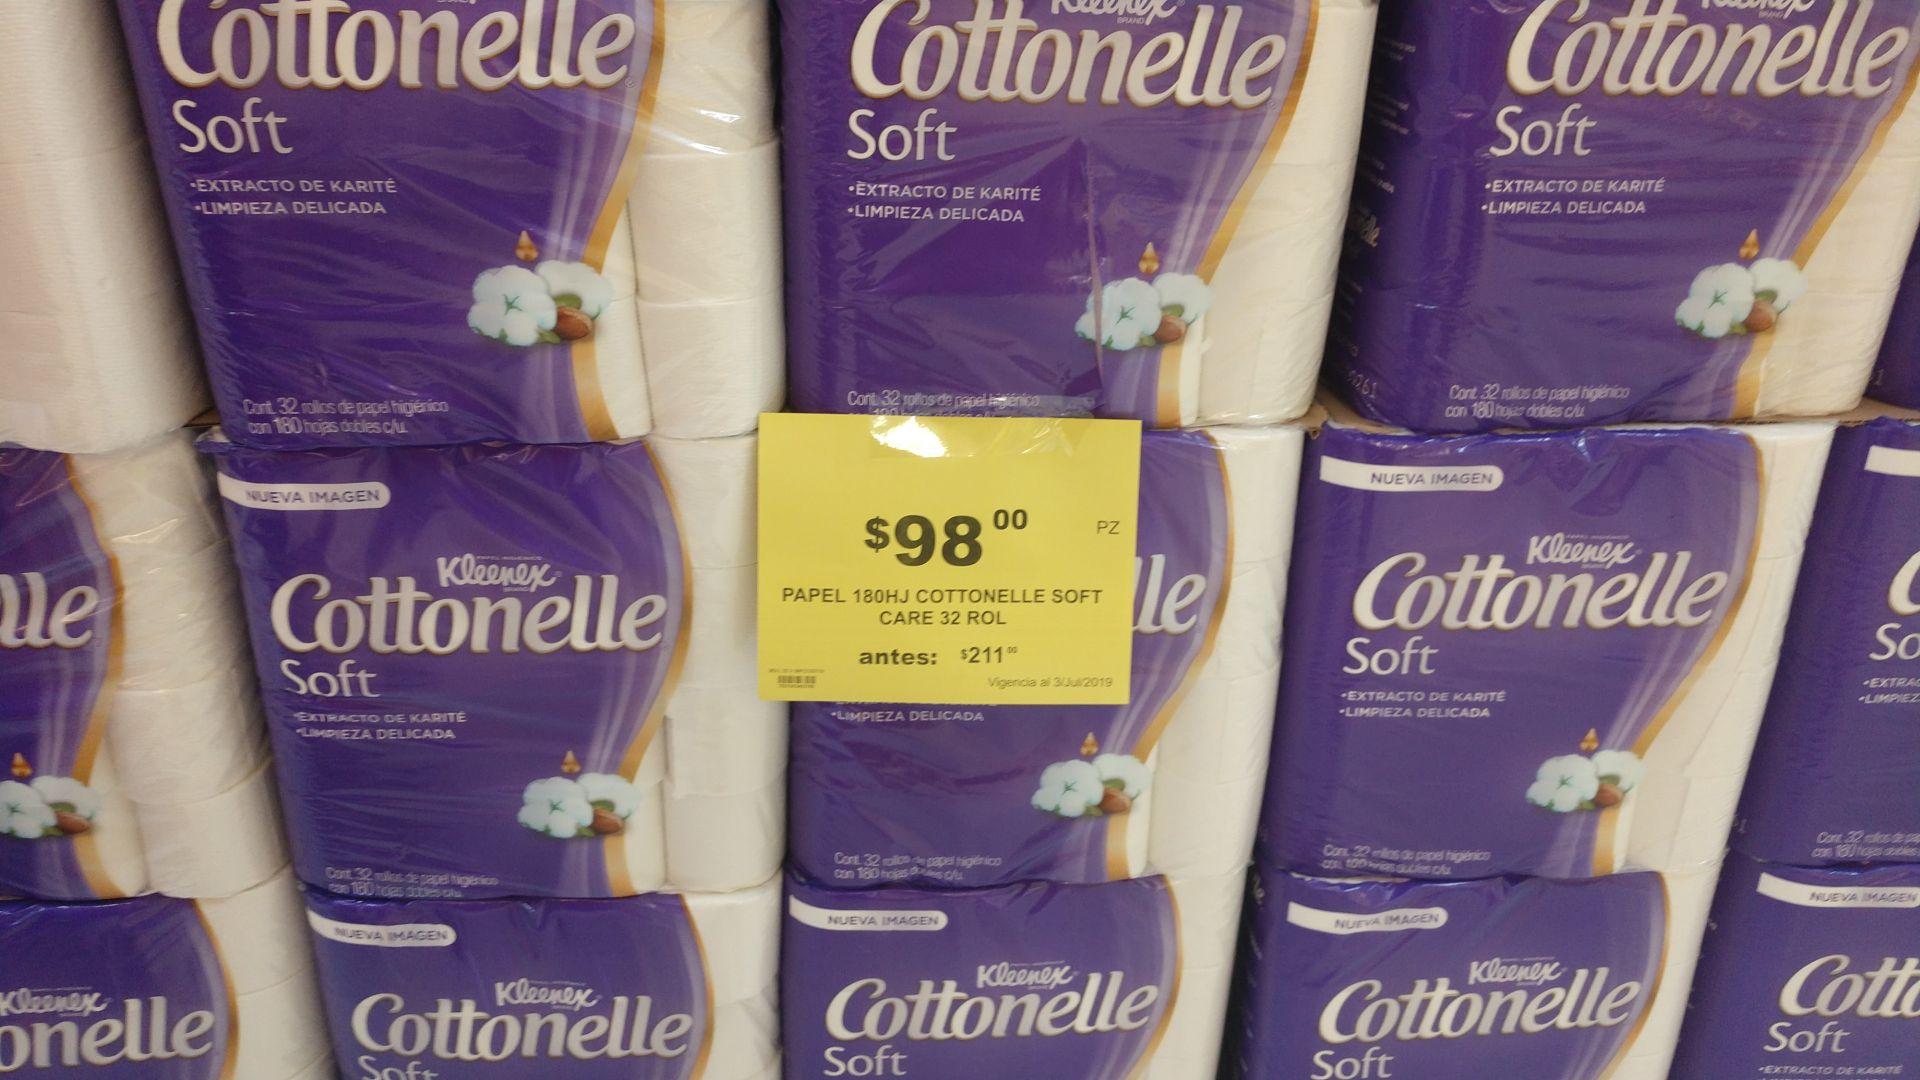 Soriana Híper: Papel higiénico Kleenex Cottonelle soft care